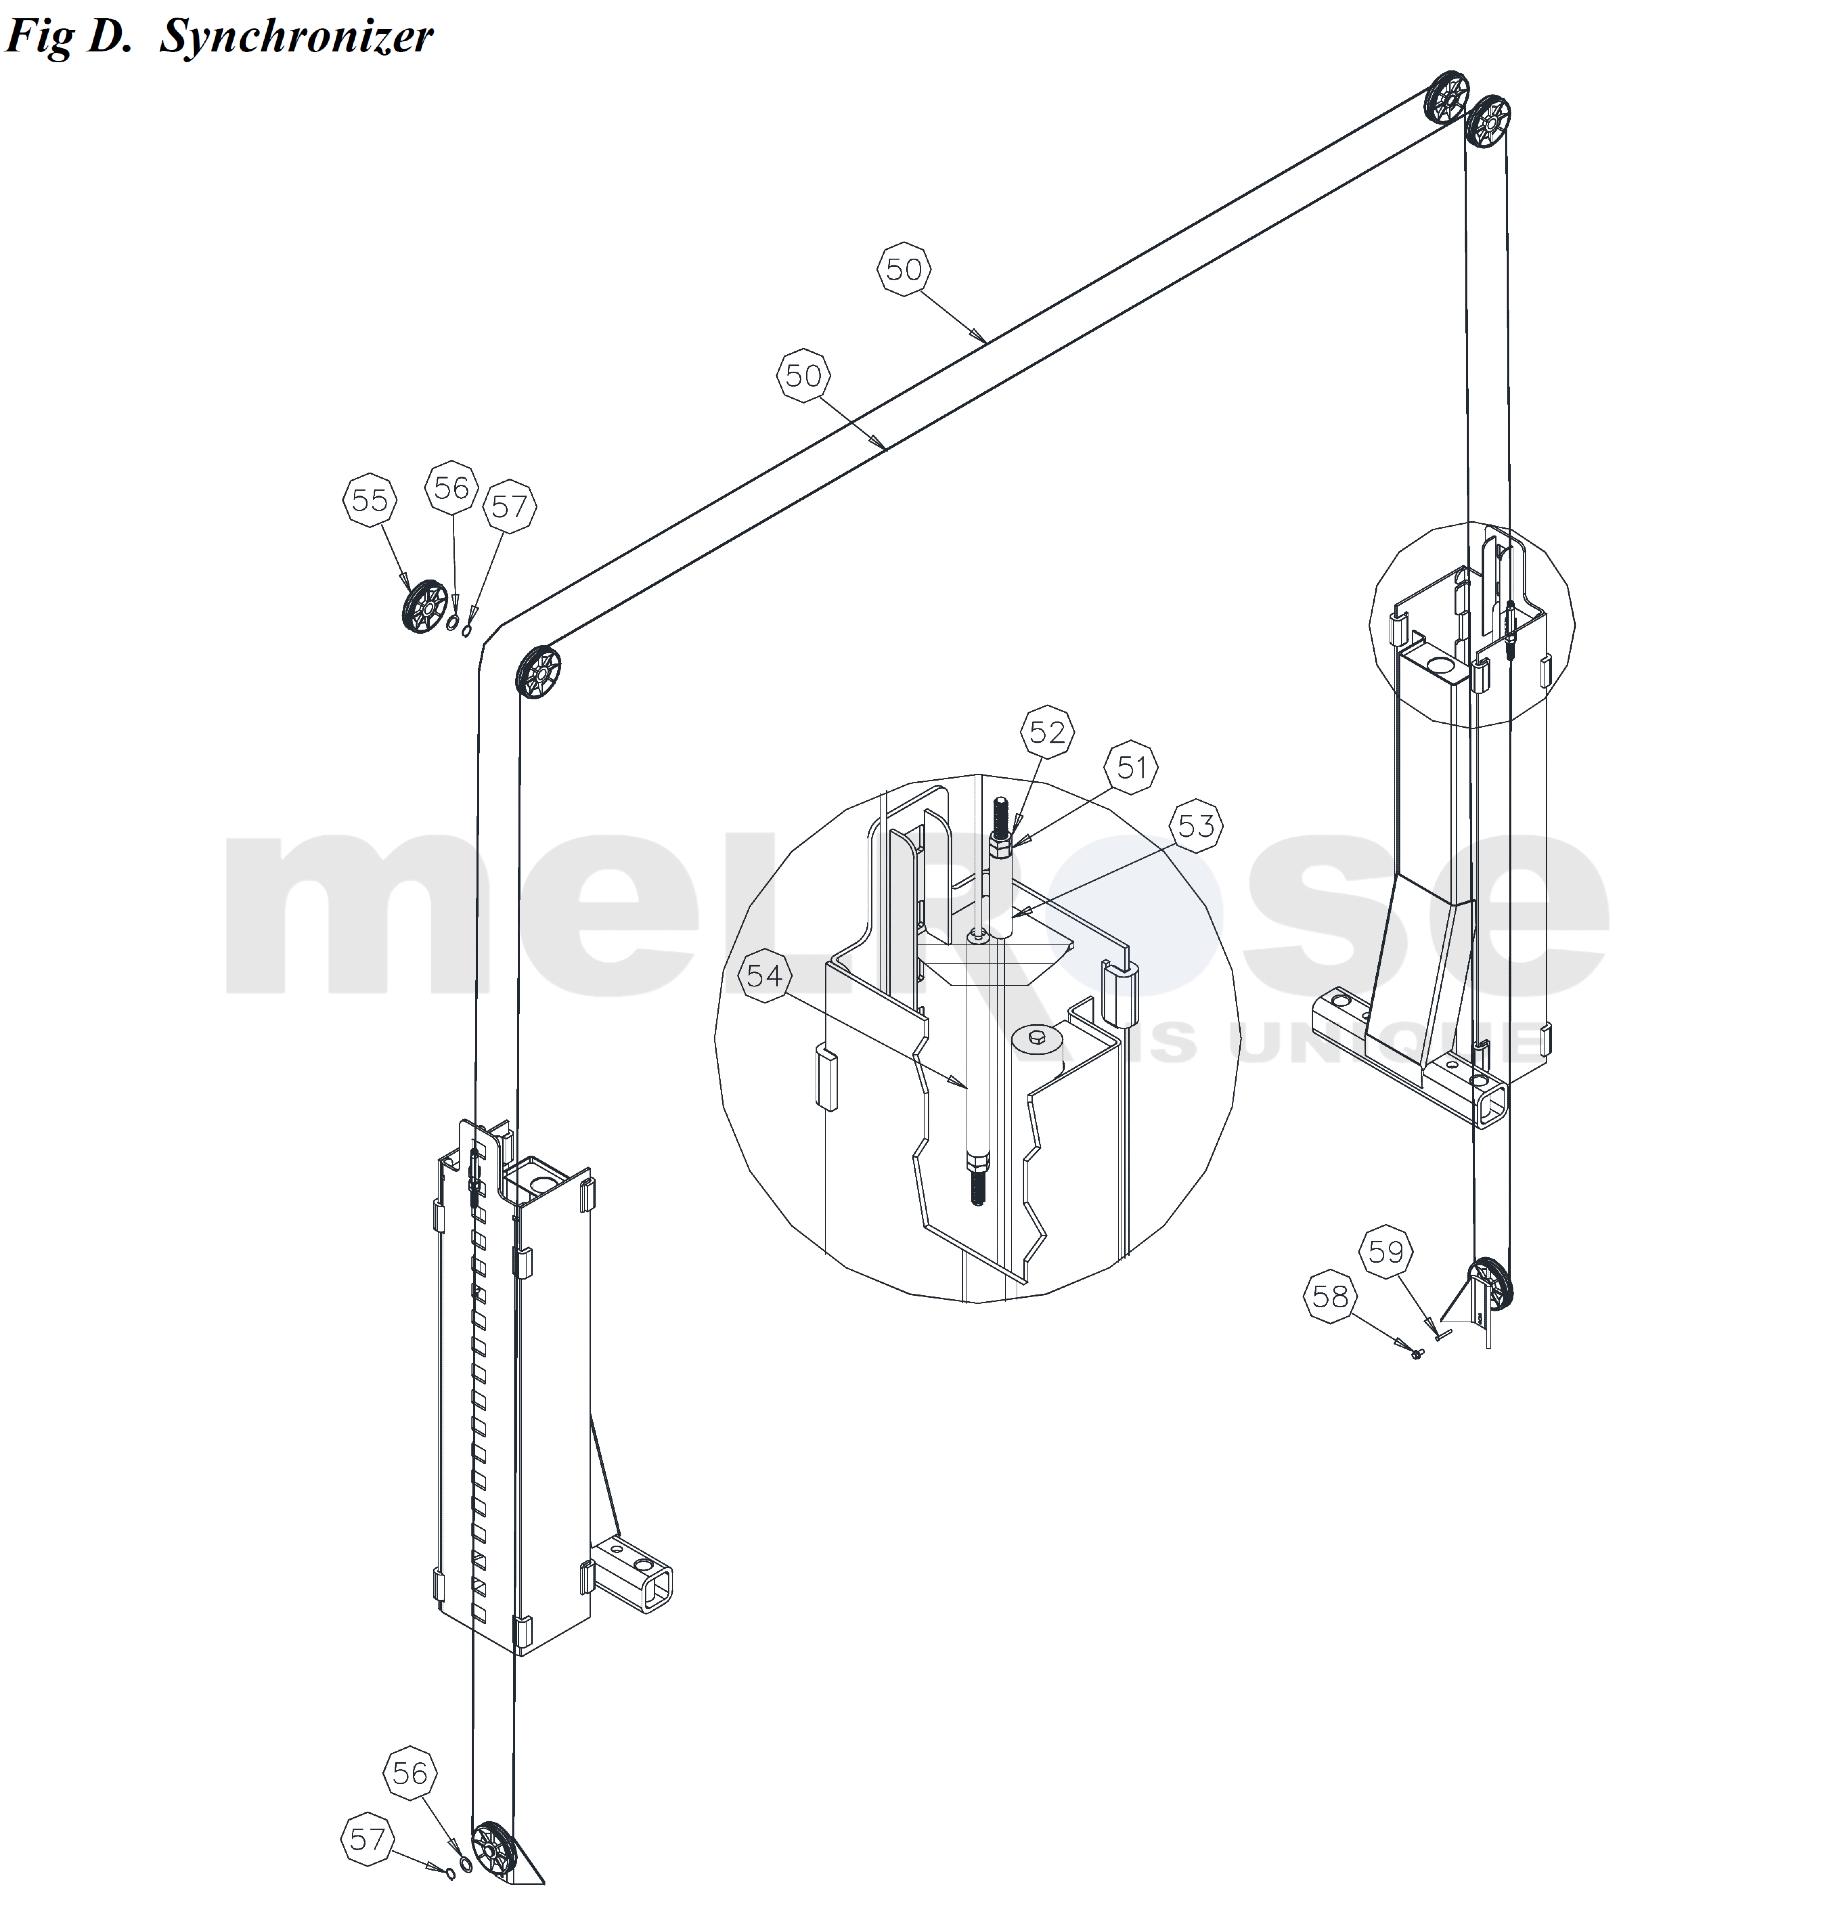 cl10-synchronizer-diagram-ii-marked.jpg